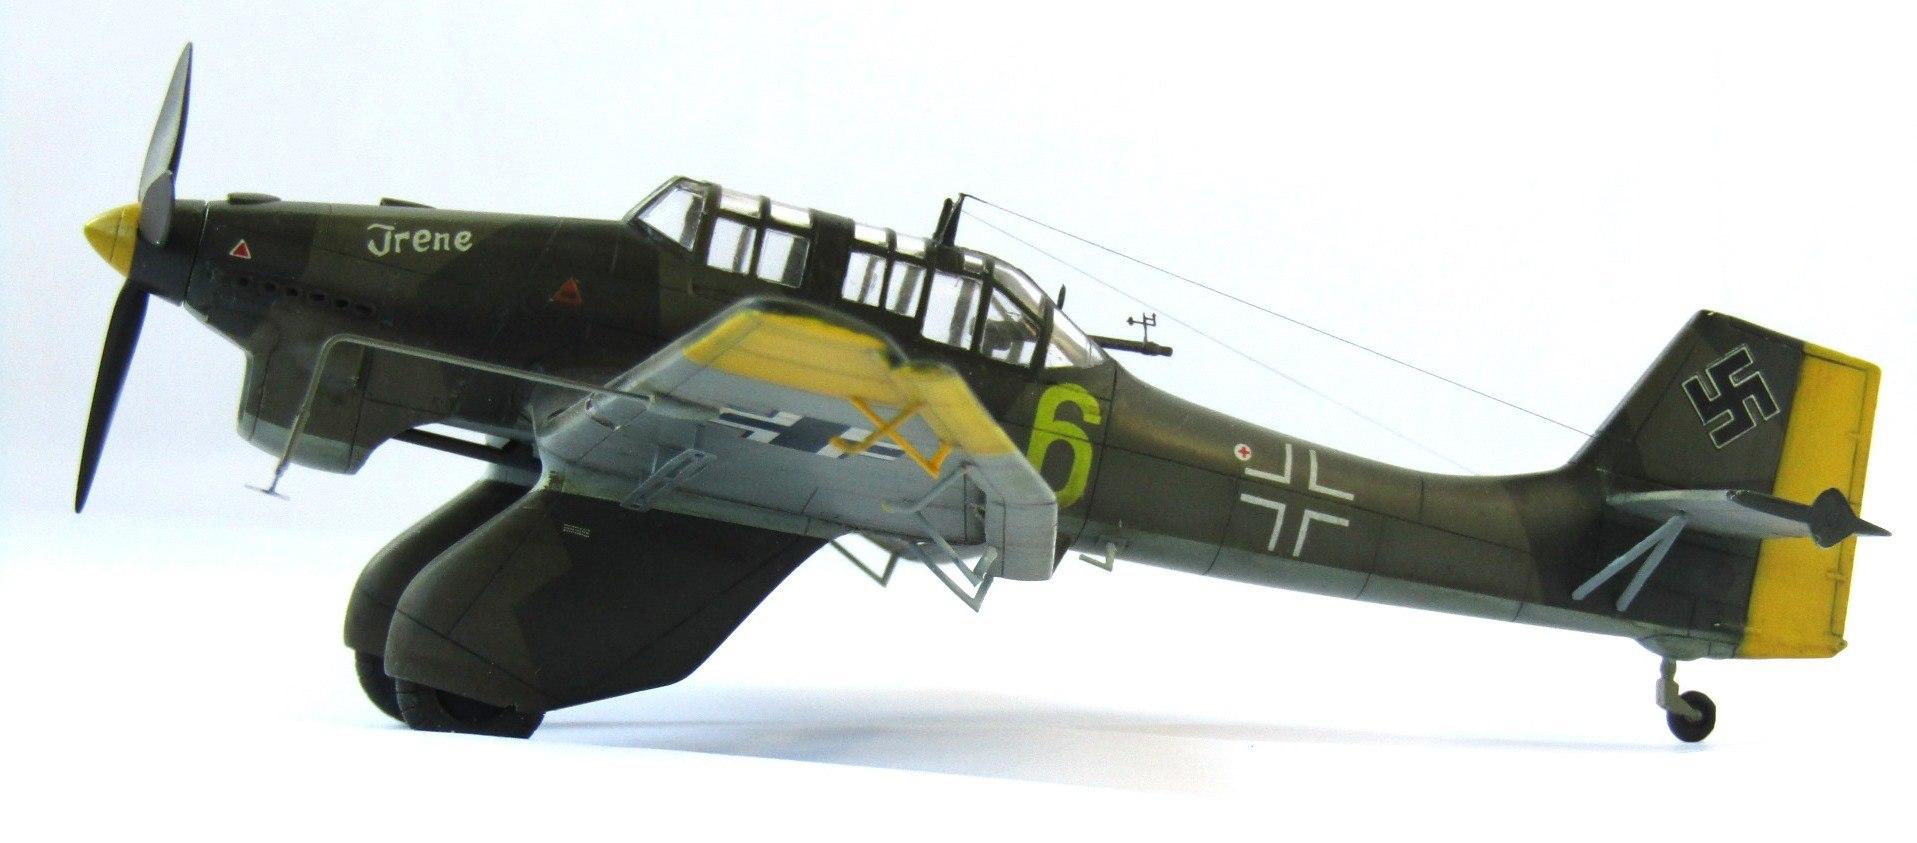 Ju-87A 1/72 (Special Hobby) F7ls0m2jIxE